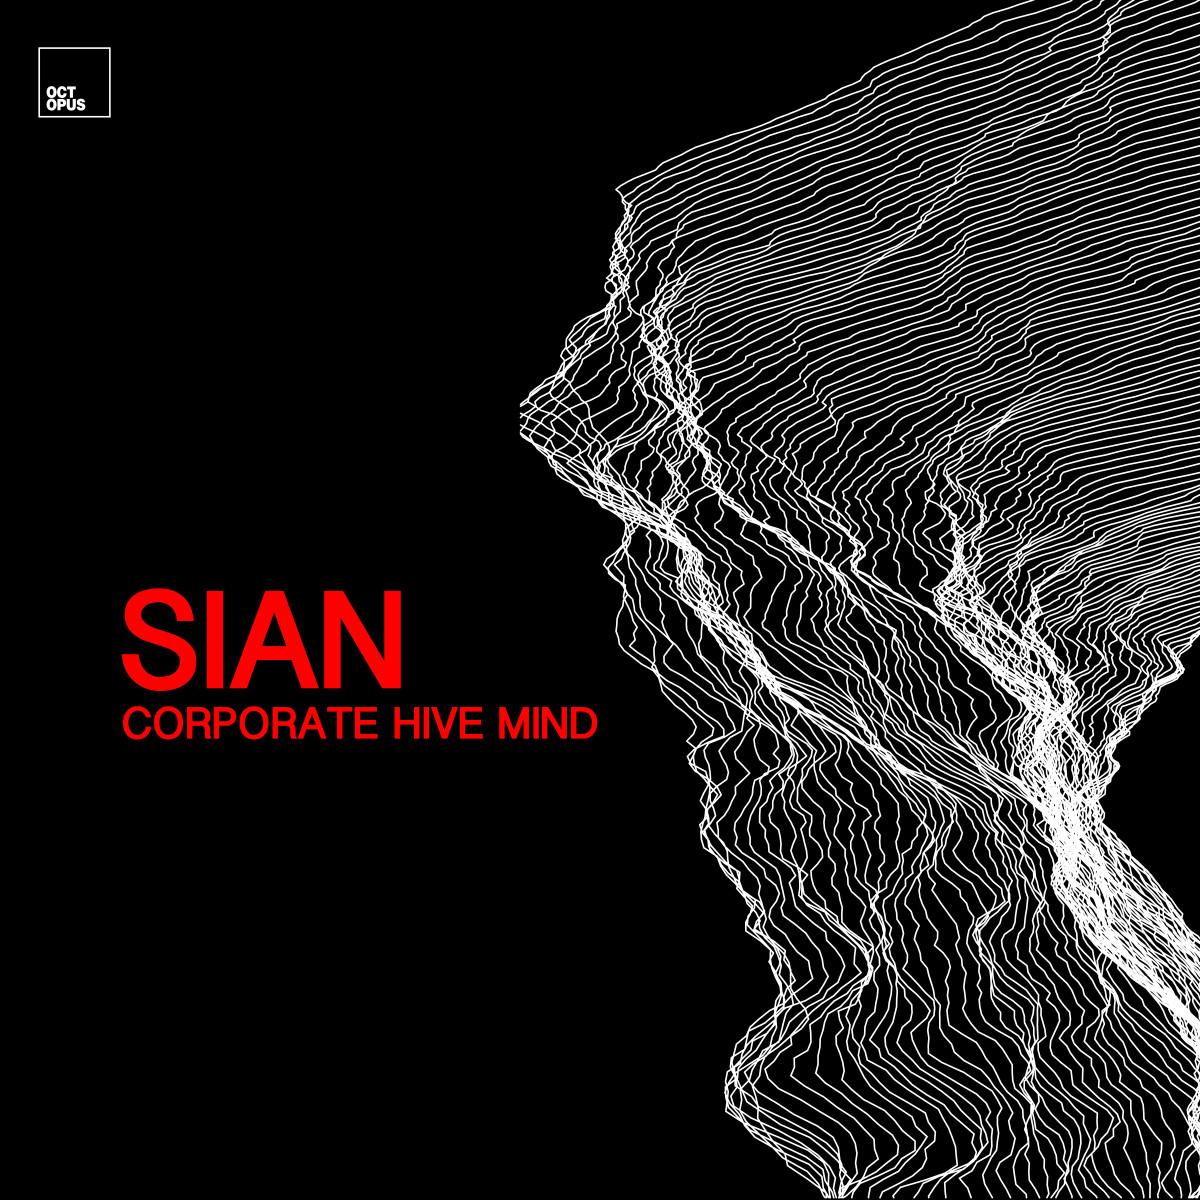 Sian Corporate Hive Mind Artwork